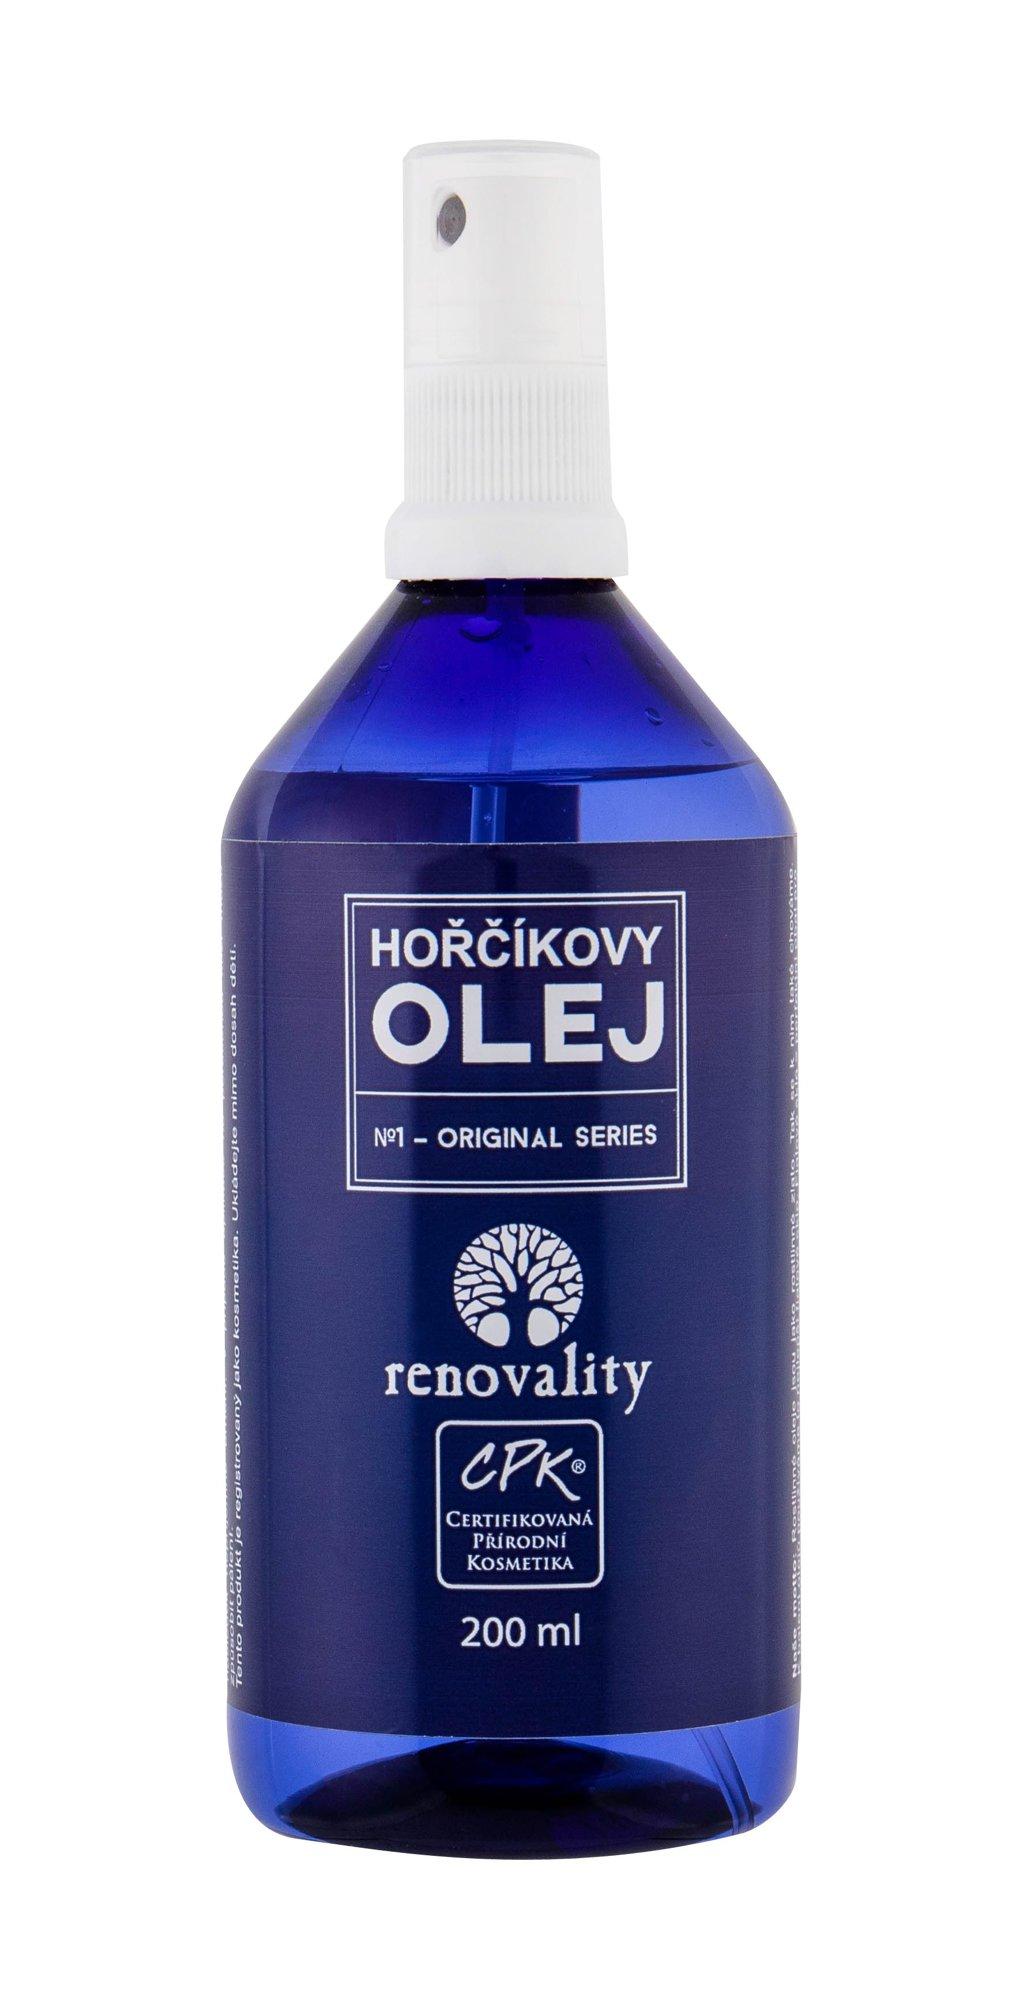 Renovality Original Series Body Oil 200ml